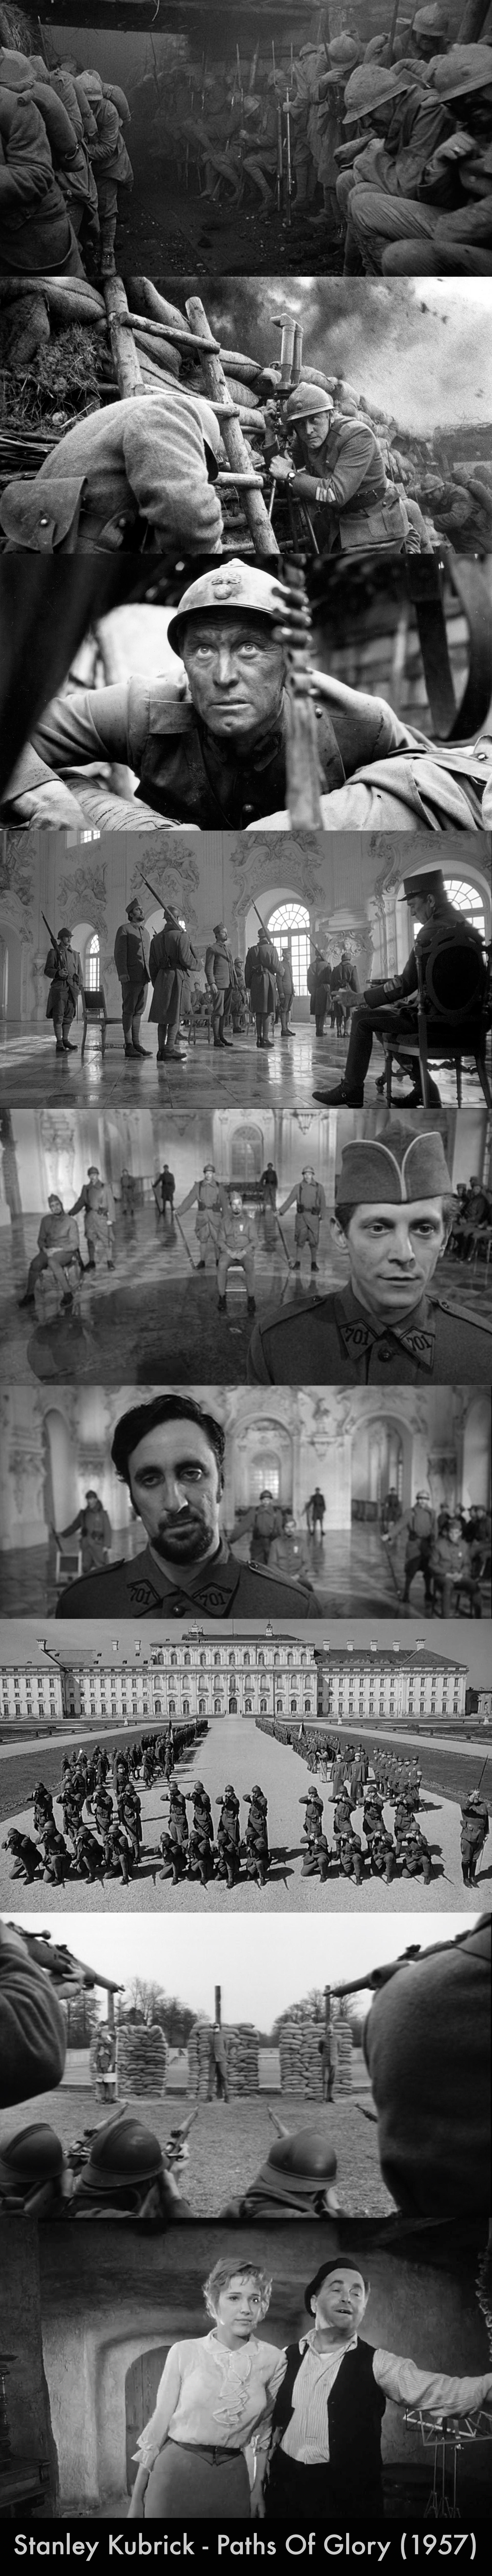 Stanley Kubrick - Paths Of Glory (1957) #PathsOfGlory #Masterpiece…